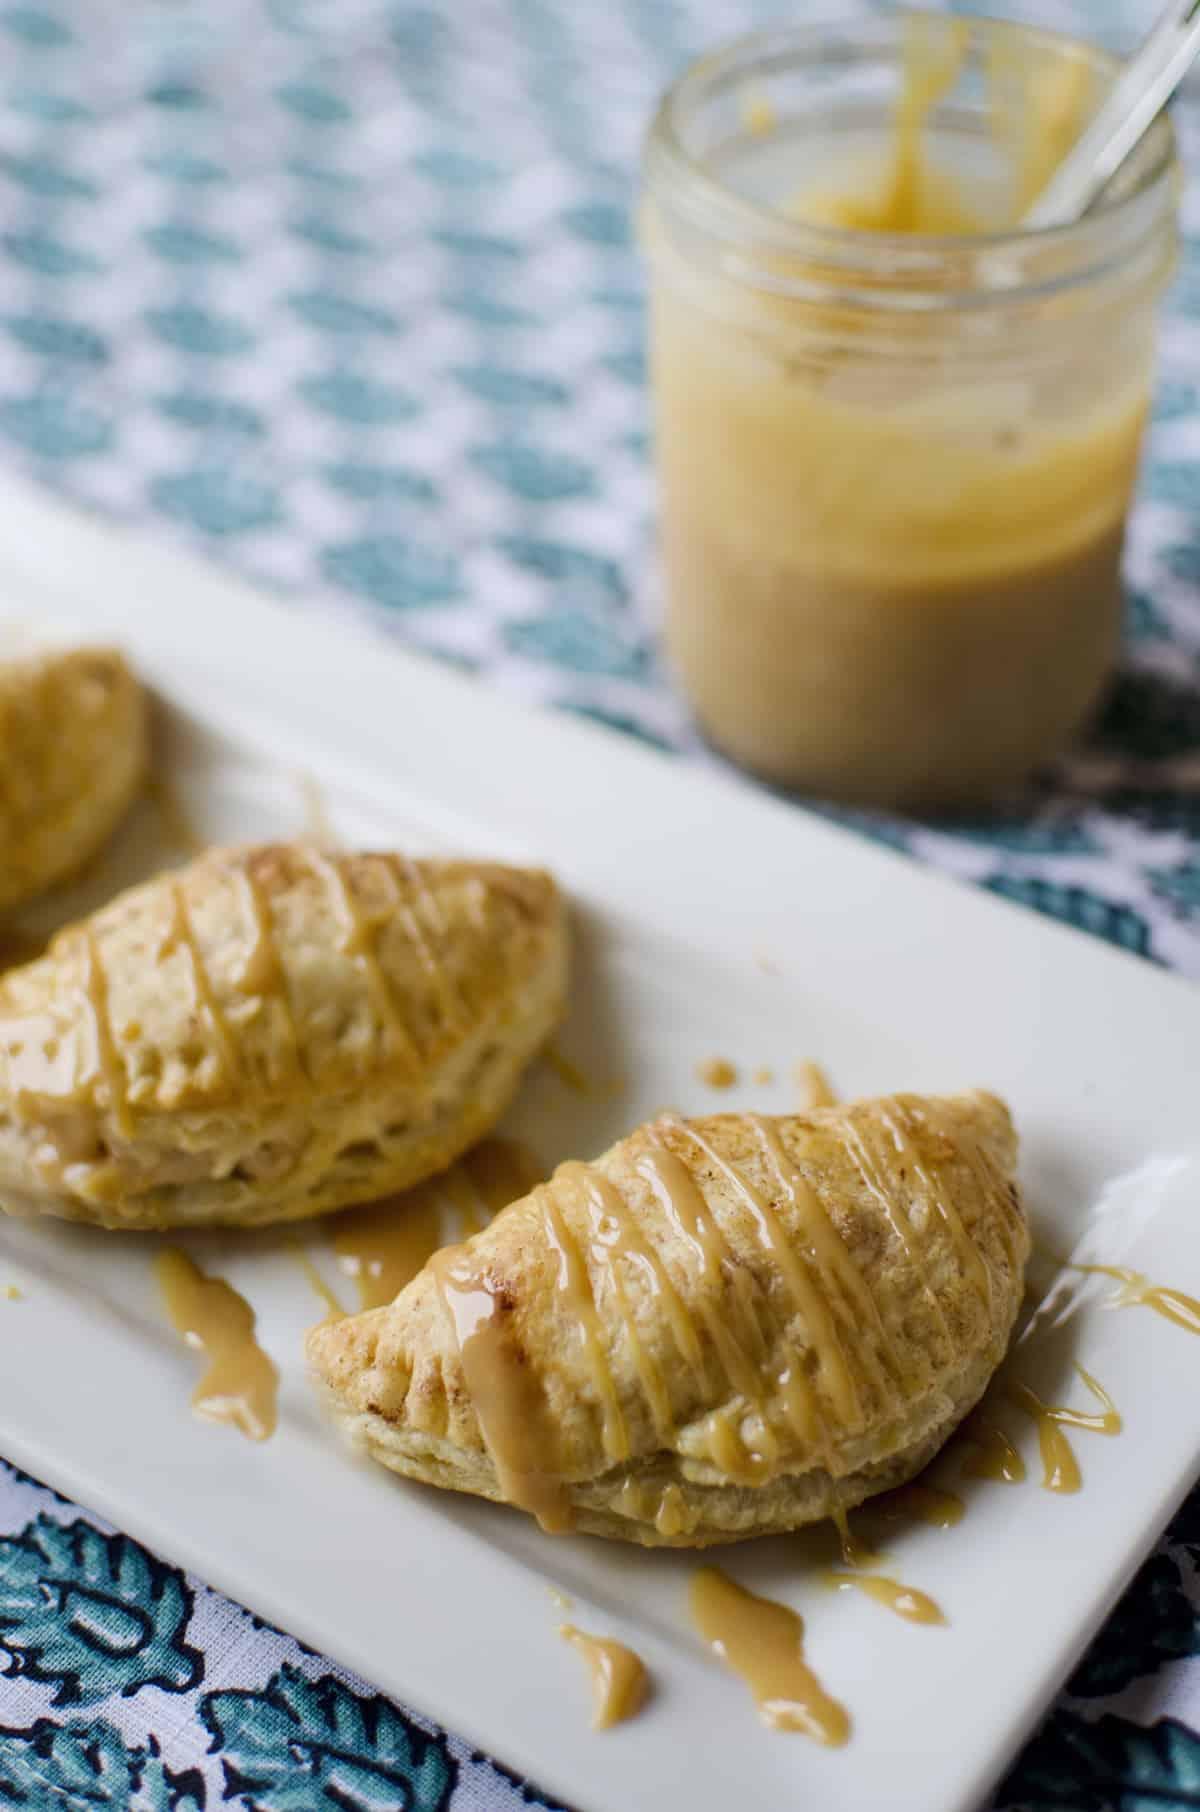 apple-_-cream-cheese-puffs-with-a-dulce-de-leche-drizzle-1